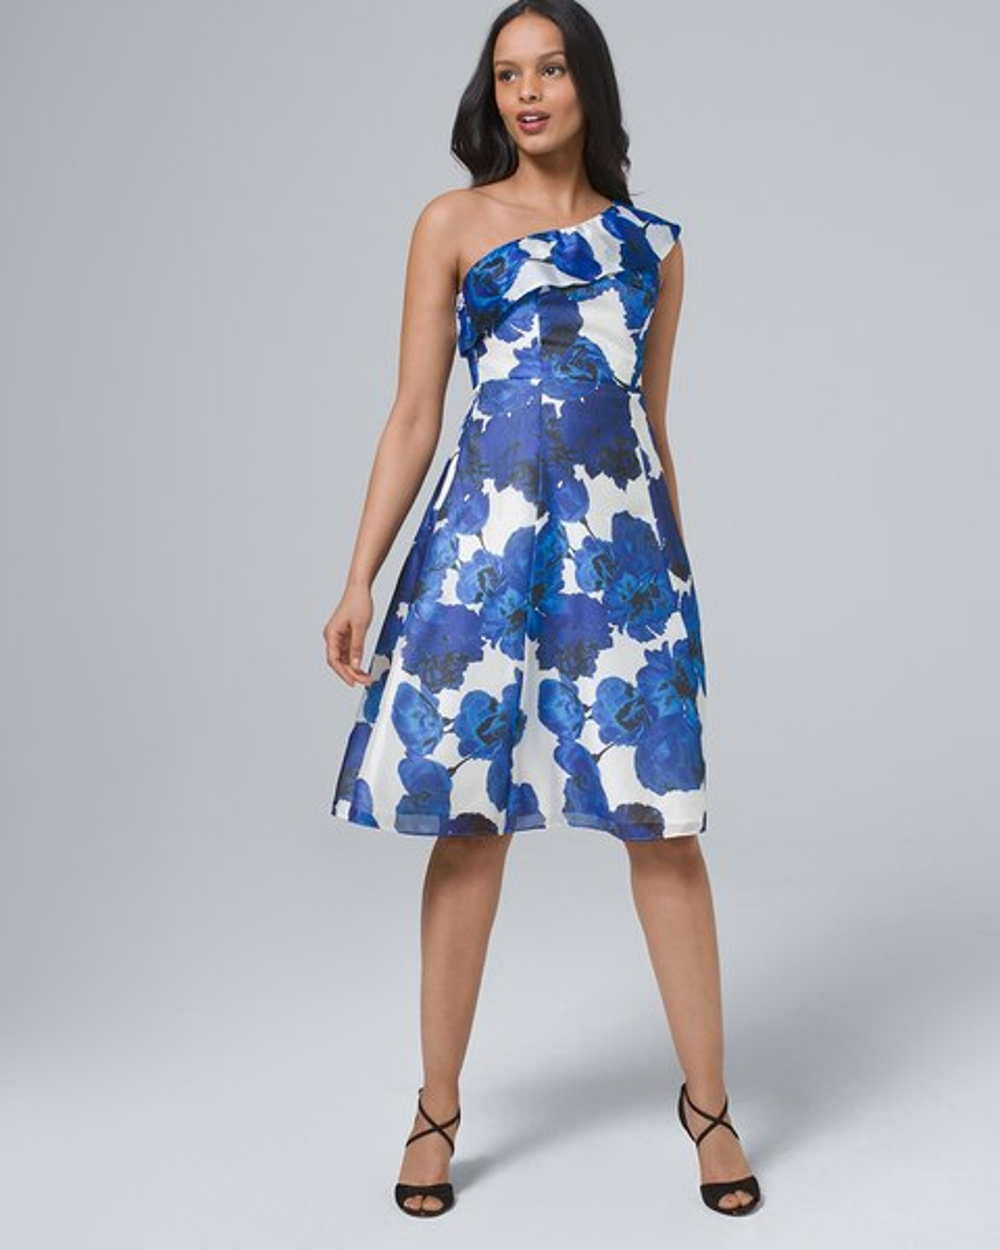 dc360857836 One-Shoulder Floral Fit-and-Flare Dress - White House Black Market